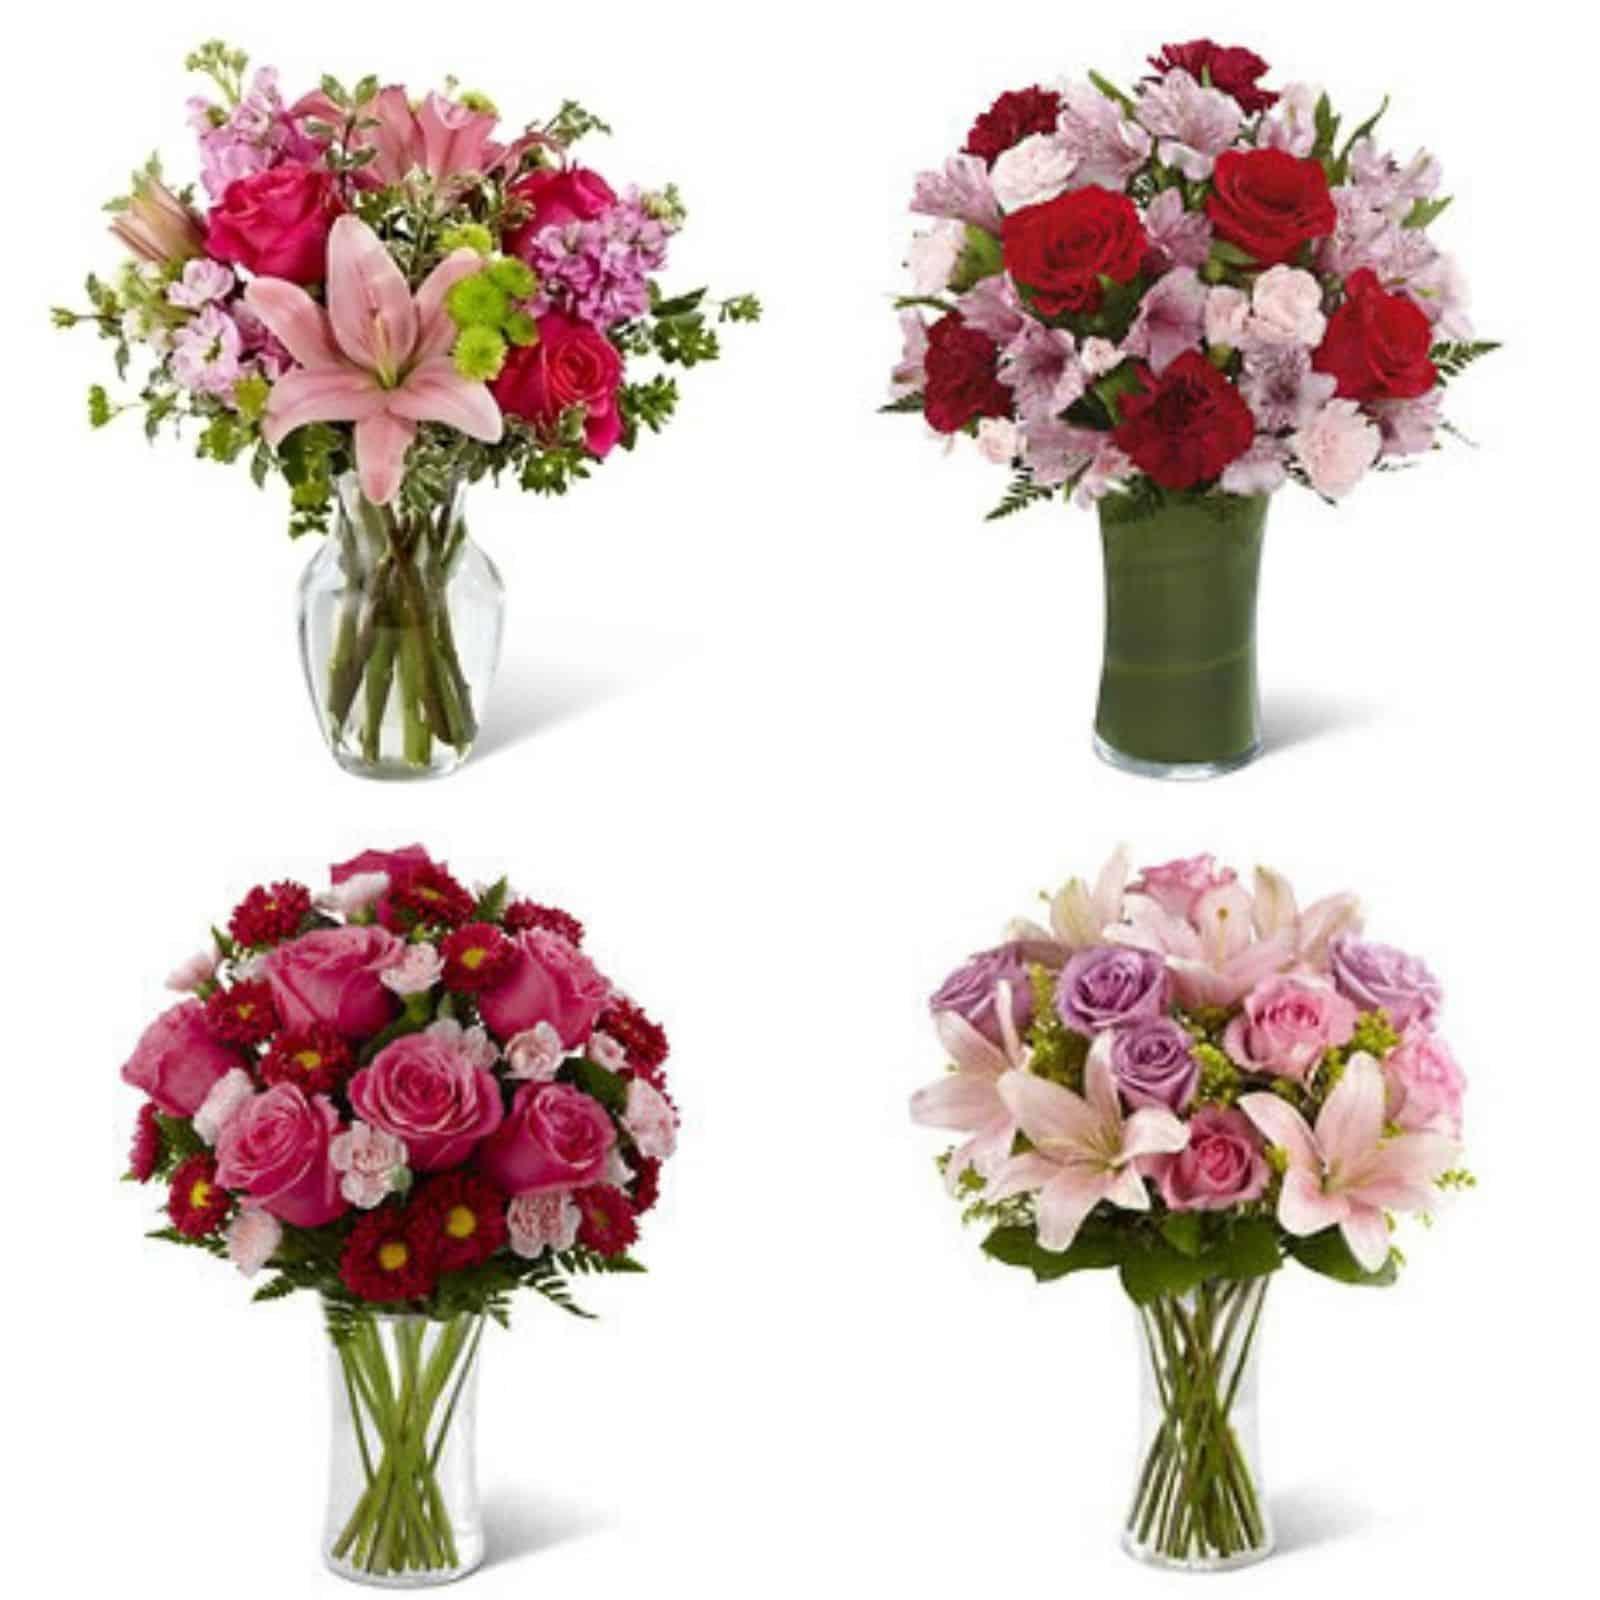 Blumenversand USA Fleurop Blumen verschicken